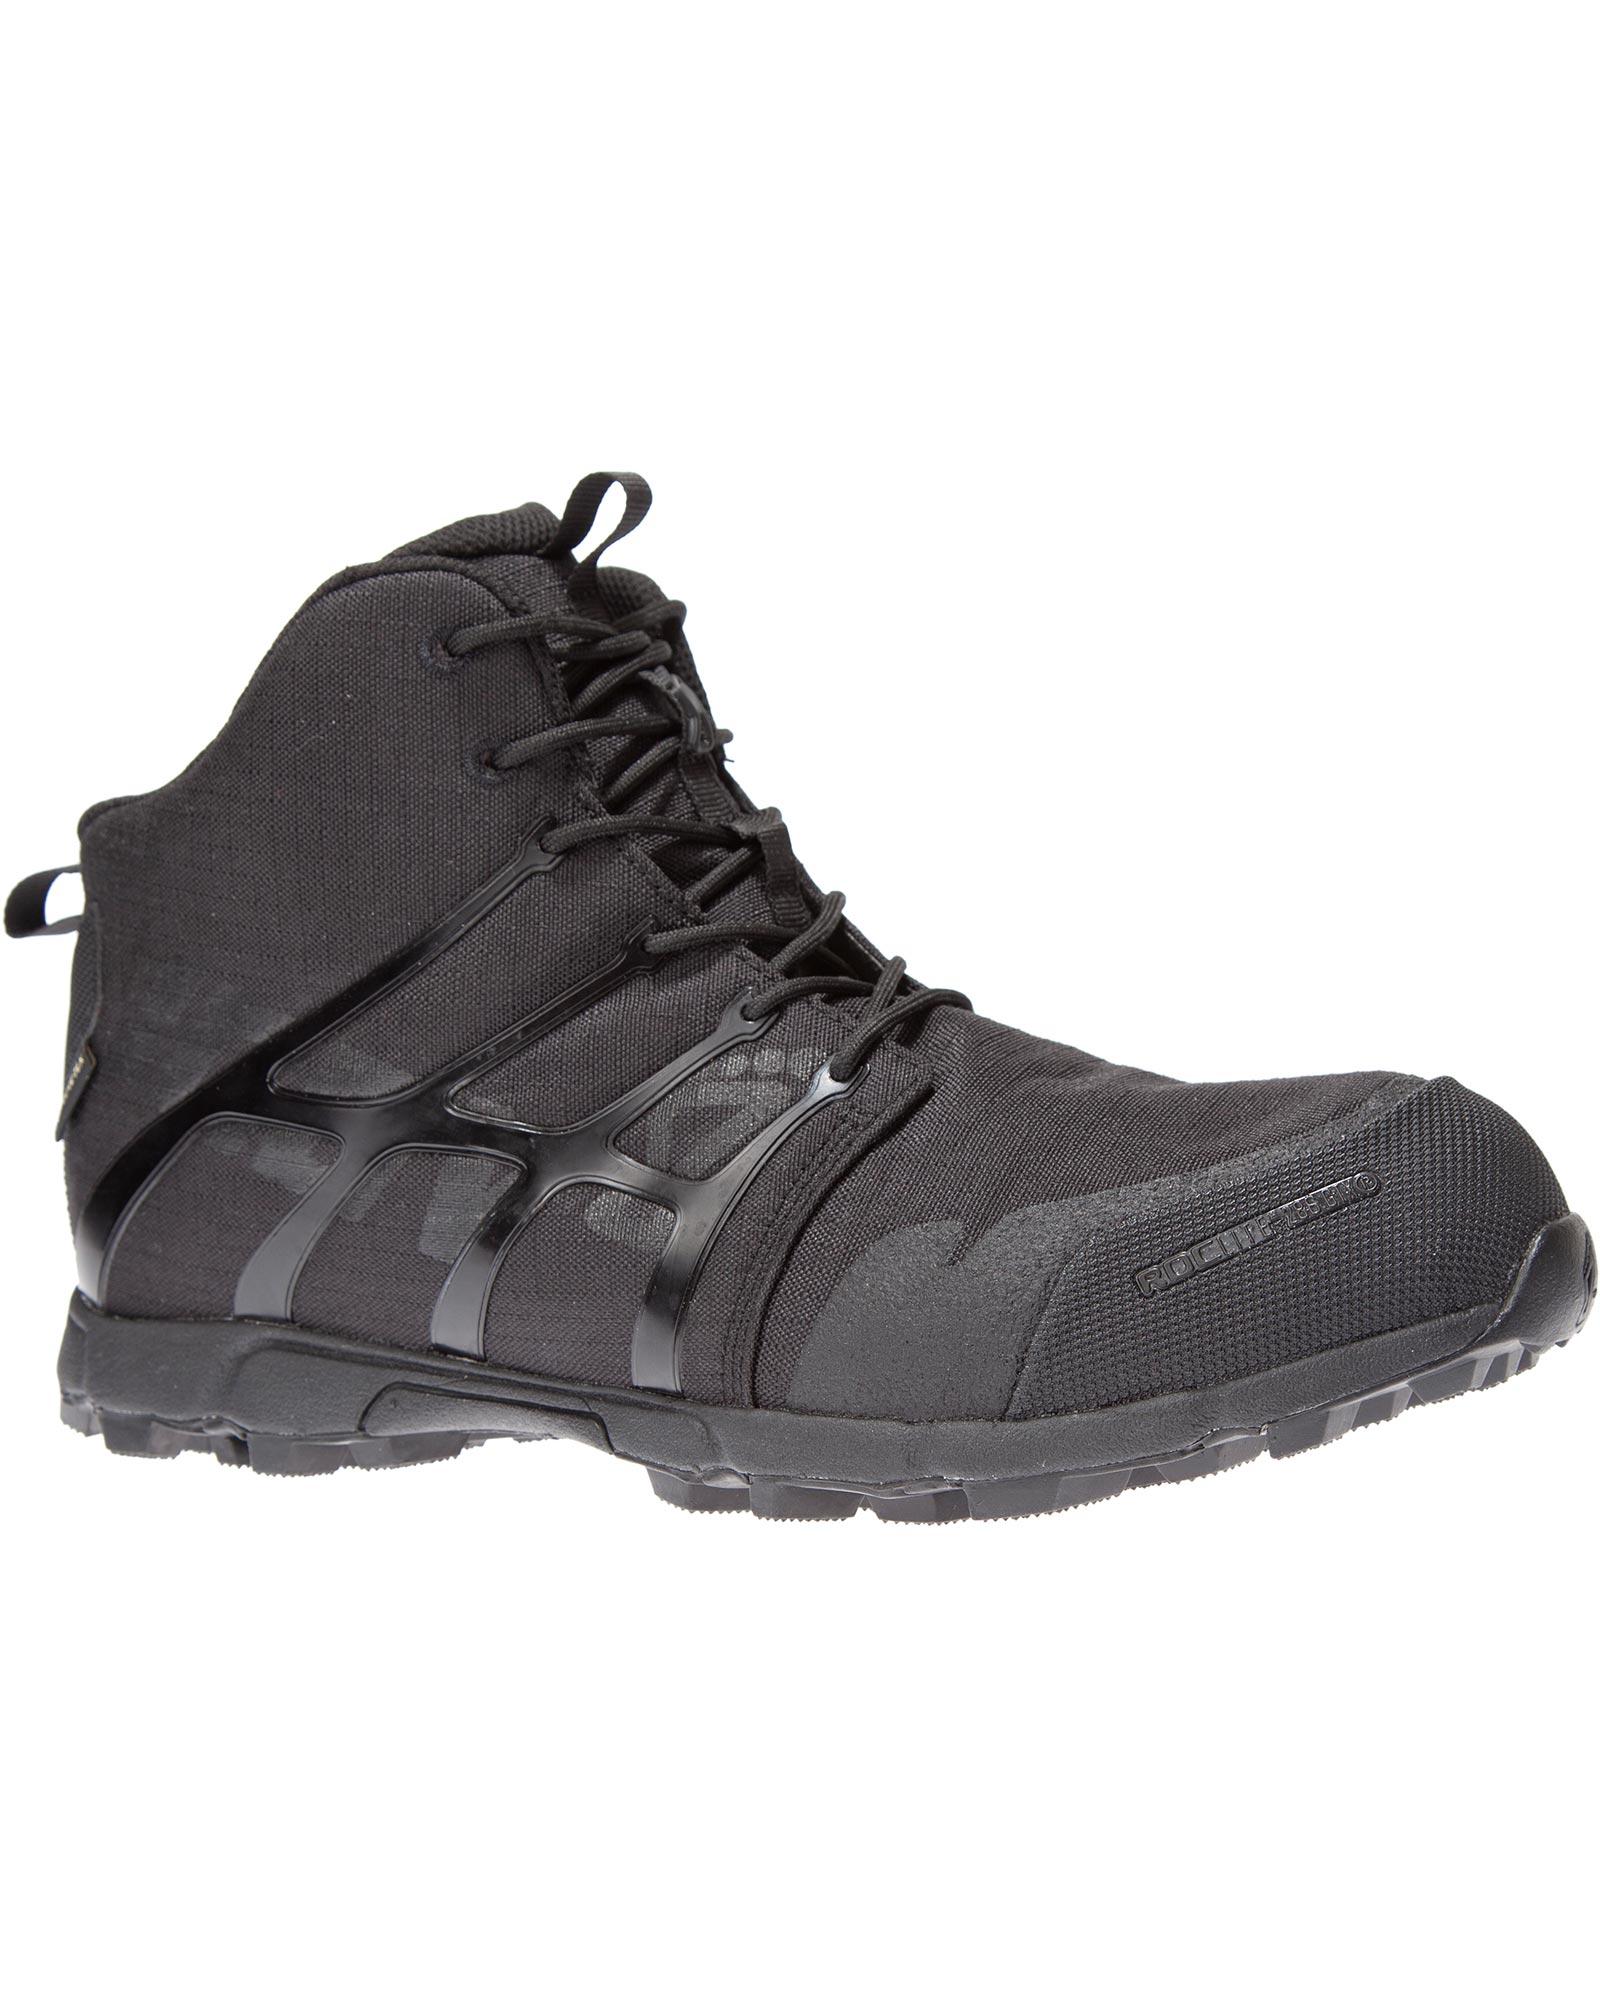 Inov-8 Men's Roclite G 286 Mid GORE-TEX Walking Boots 0